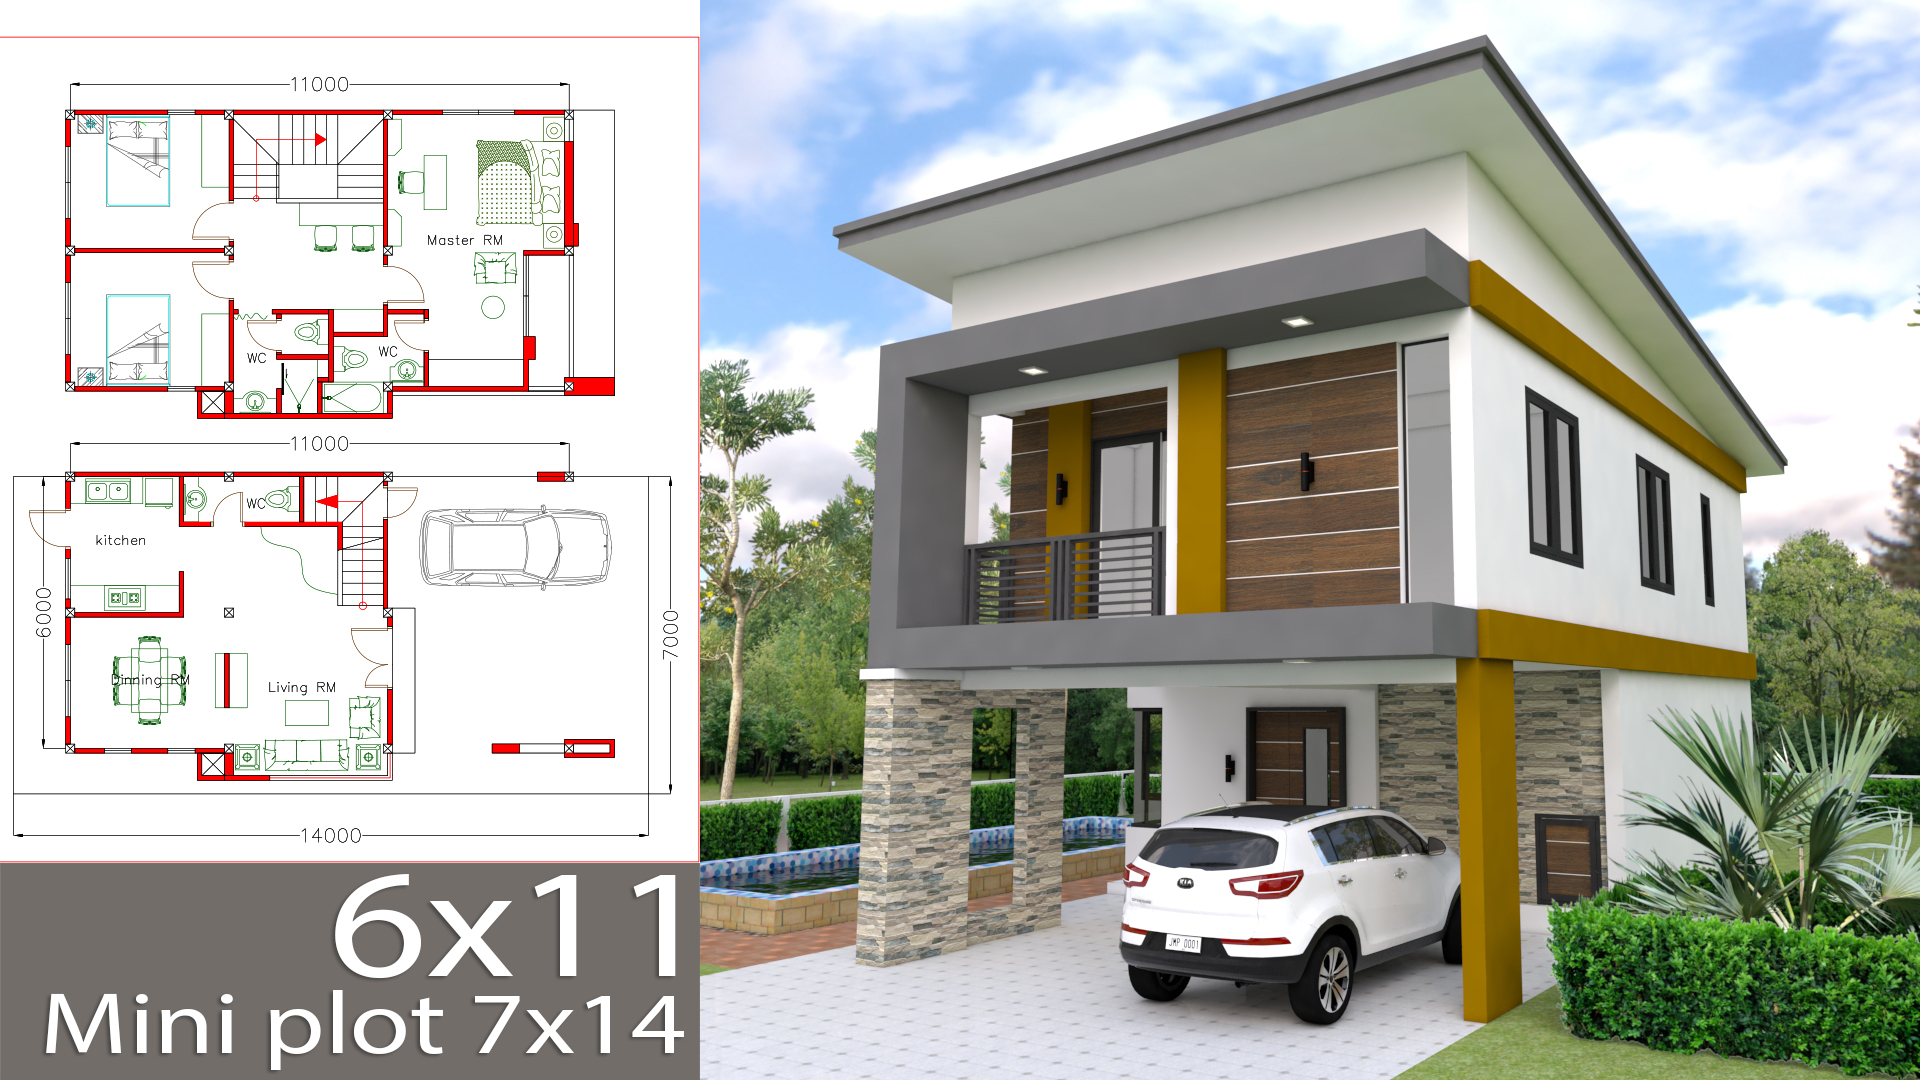 Small Home Design Plan 6x11m With 3 Bedrooms Samphoas Plan